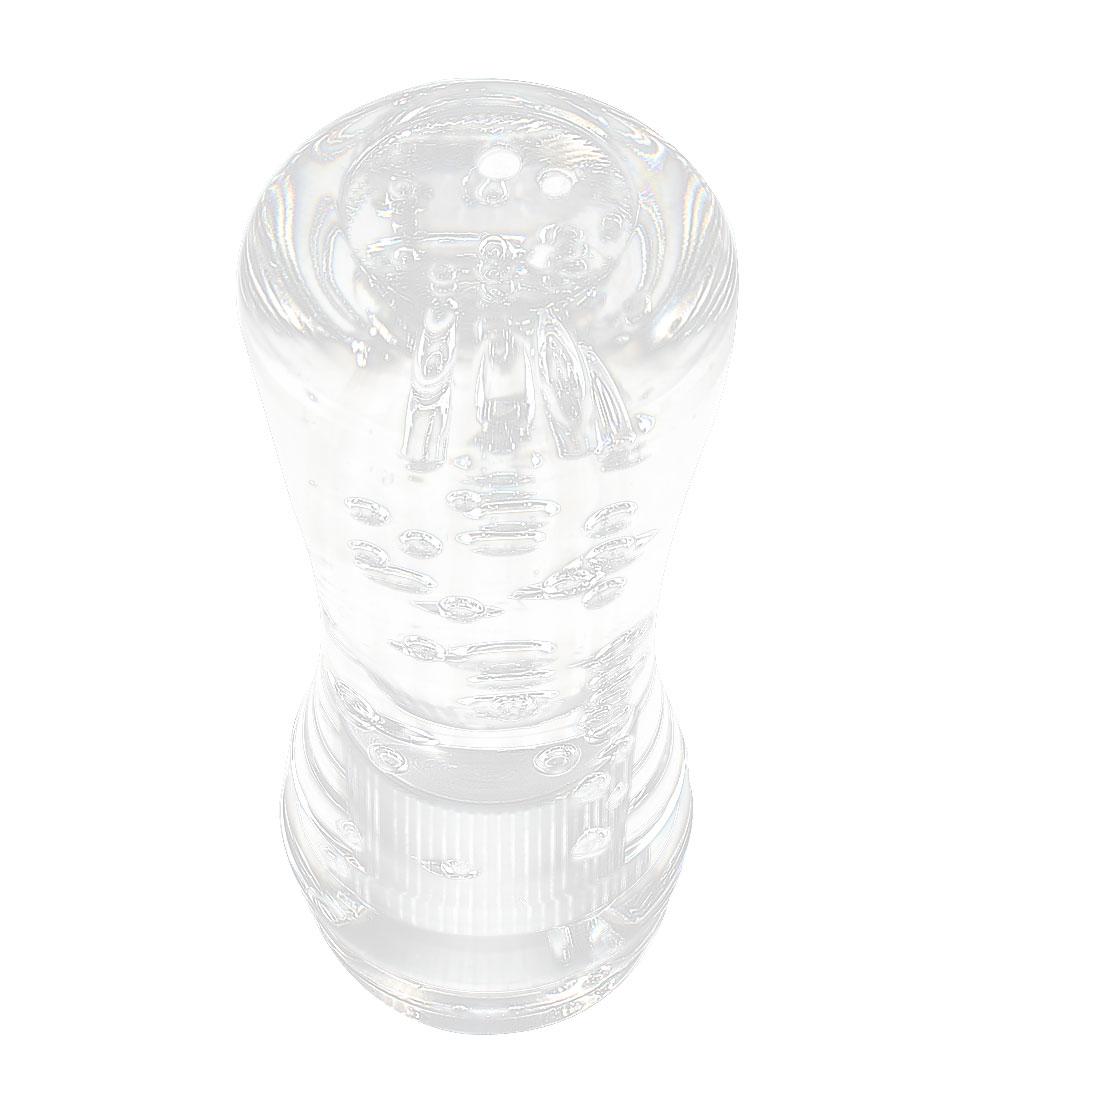 Auto Clear Bubble Screw on Manual Gear Stick Shift Knob Cover 10cm High